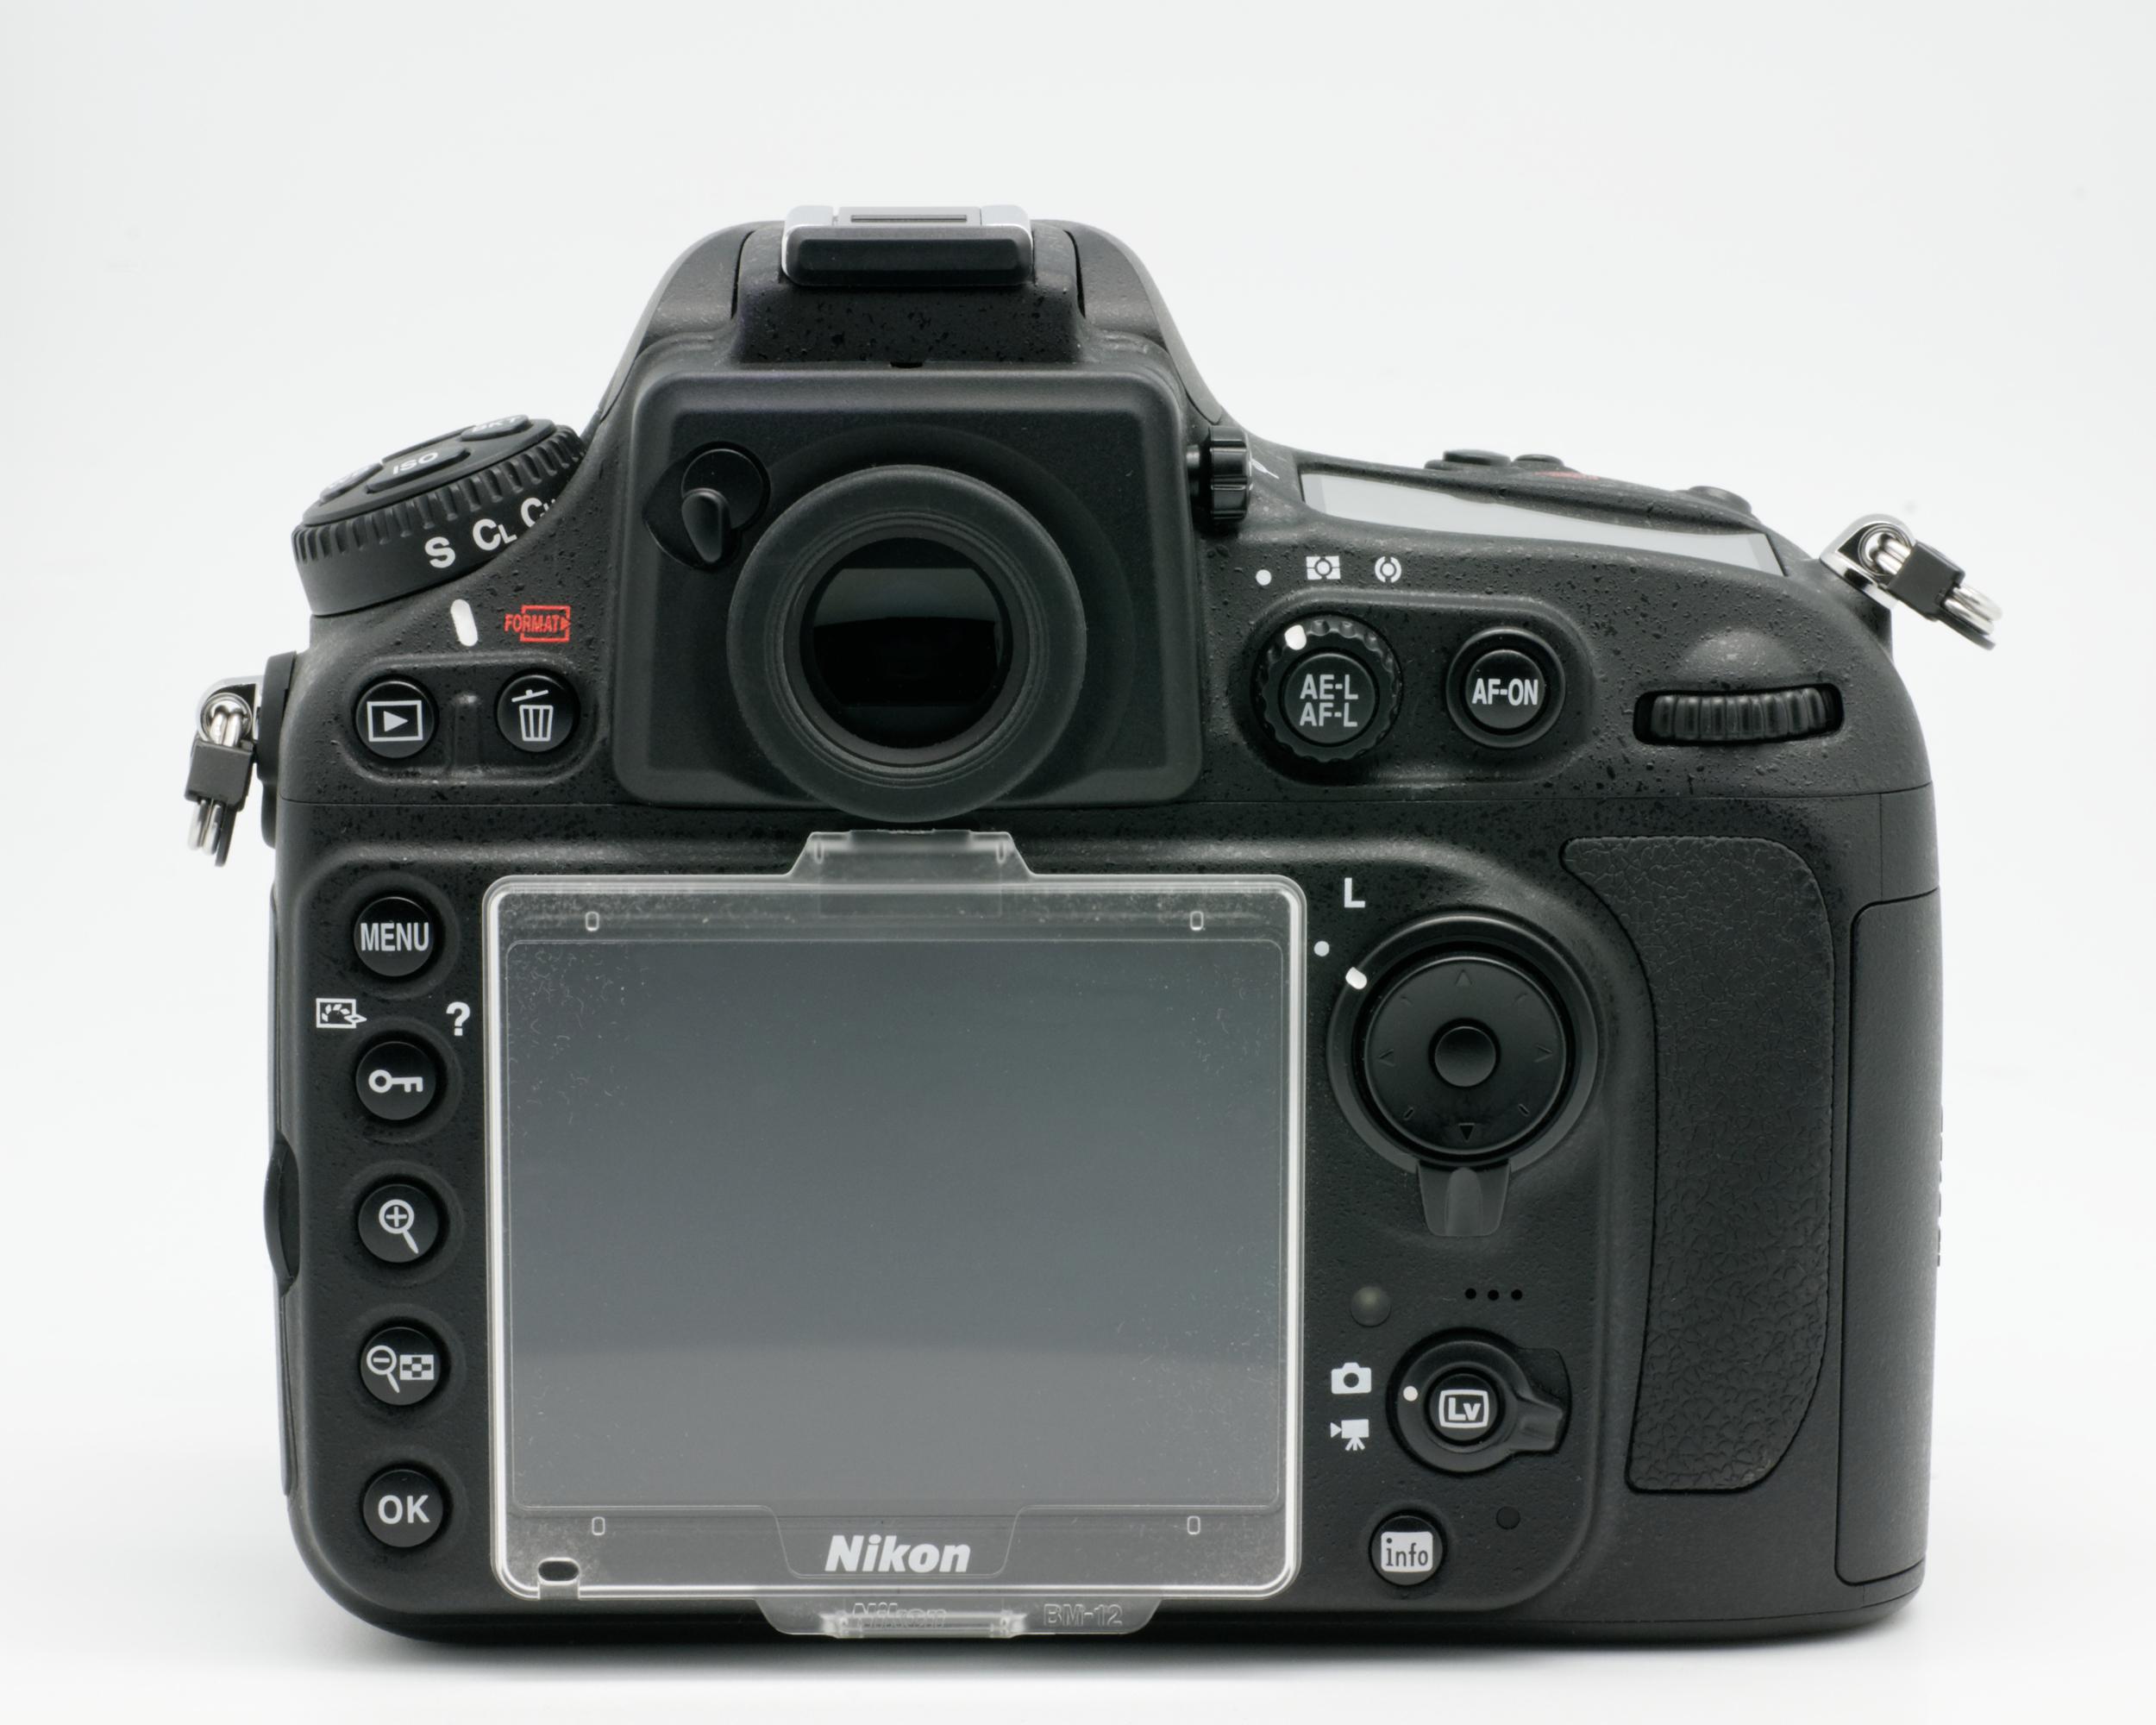 Nikon_D800E_body_only_04.jpg